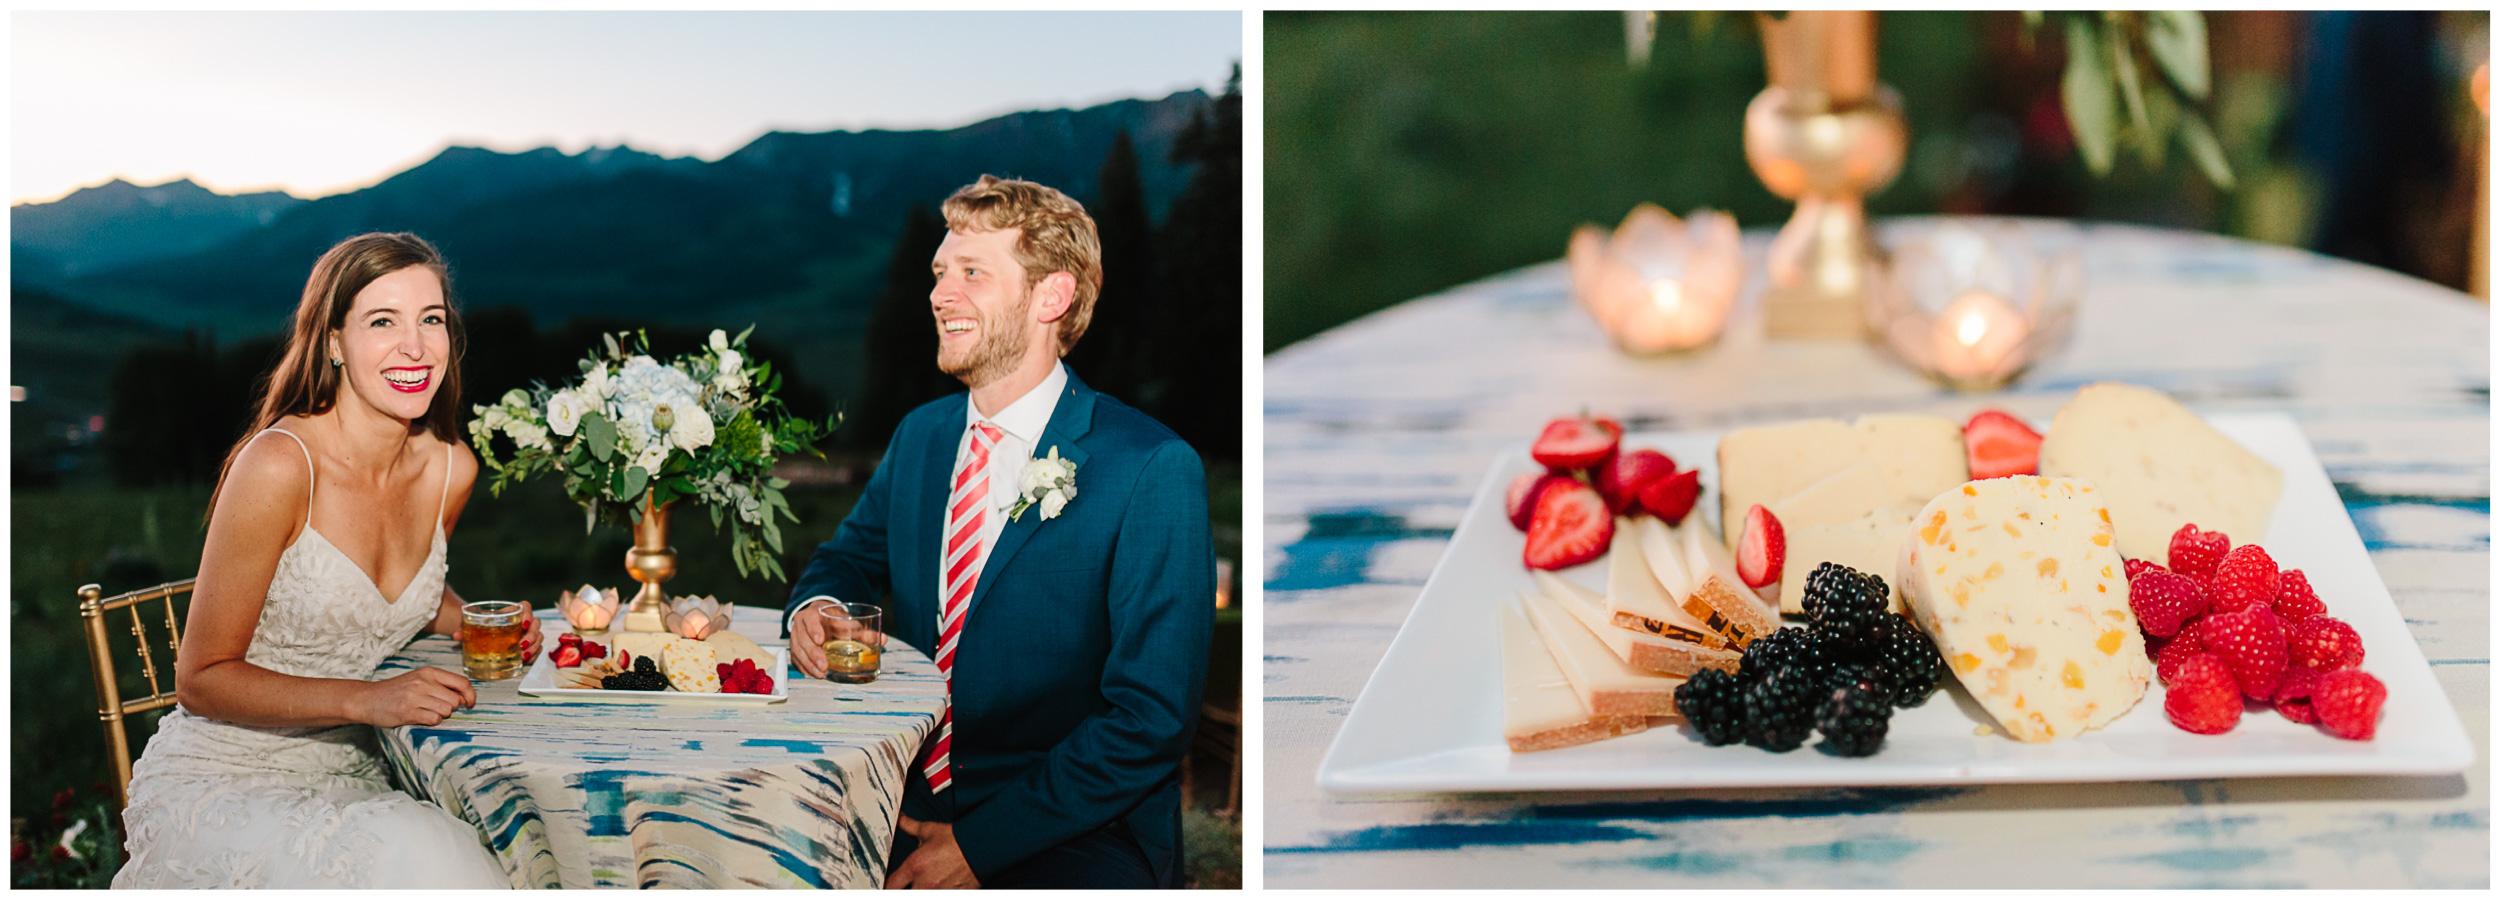 crested_butte_wedding_137.jpg